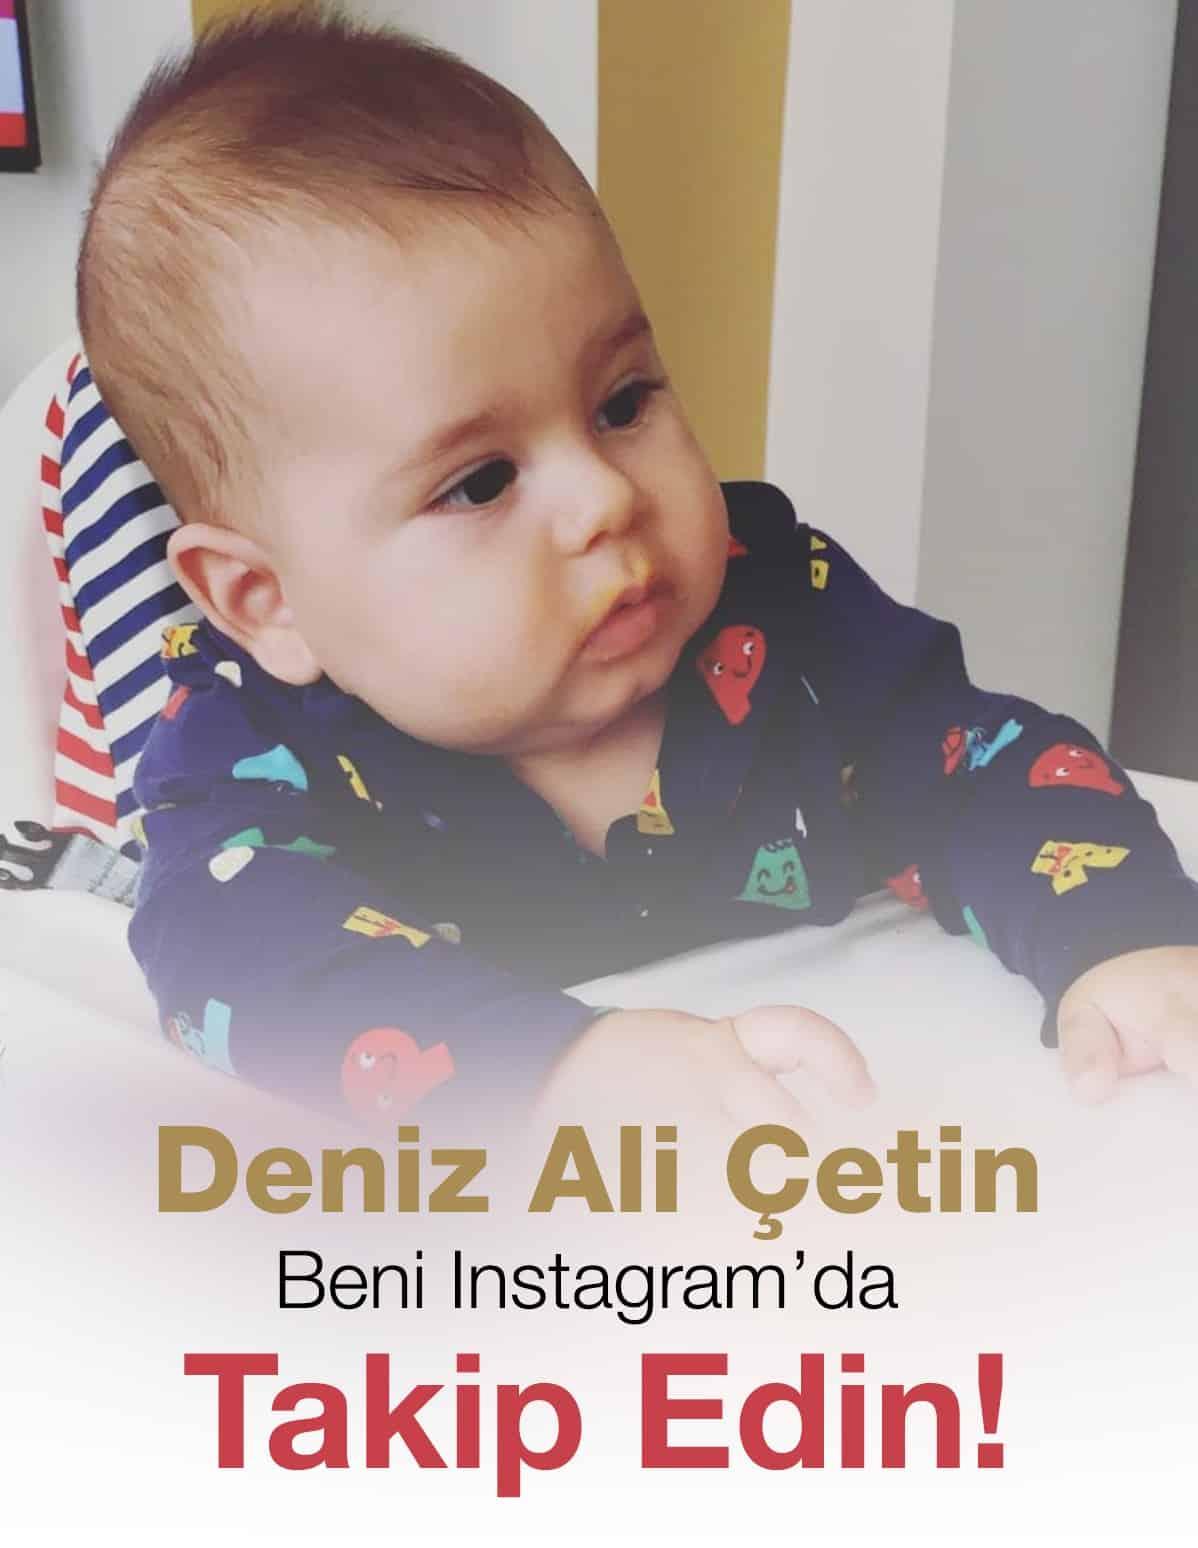 Sidebar – Deniz Ali